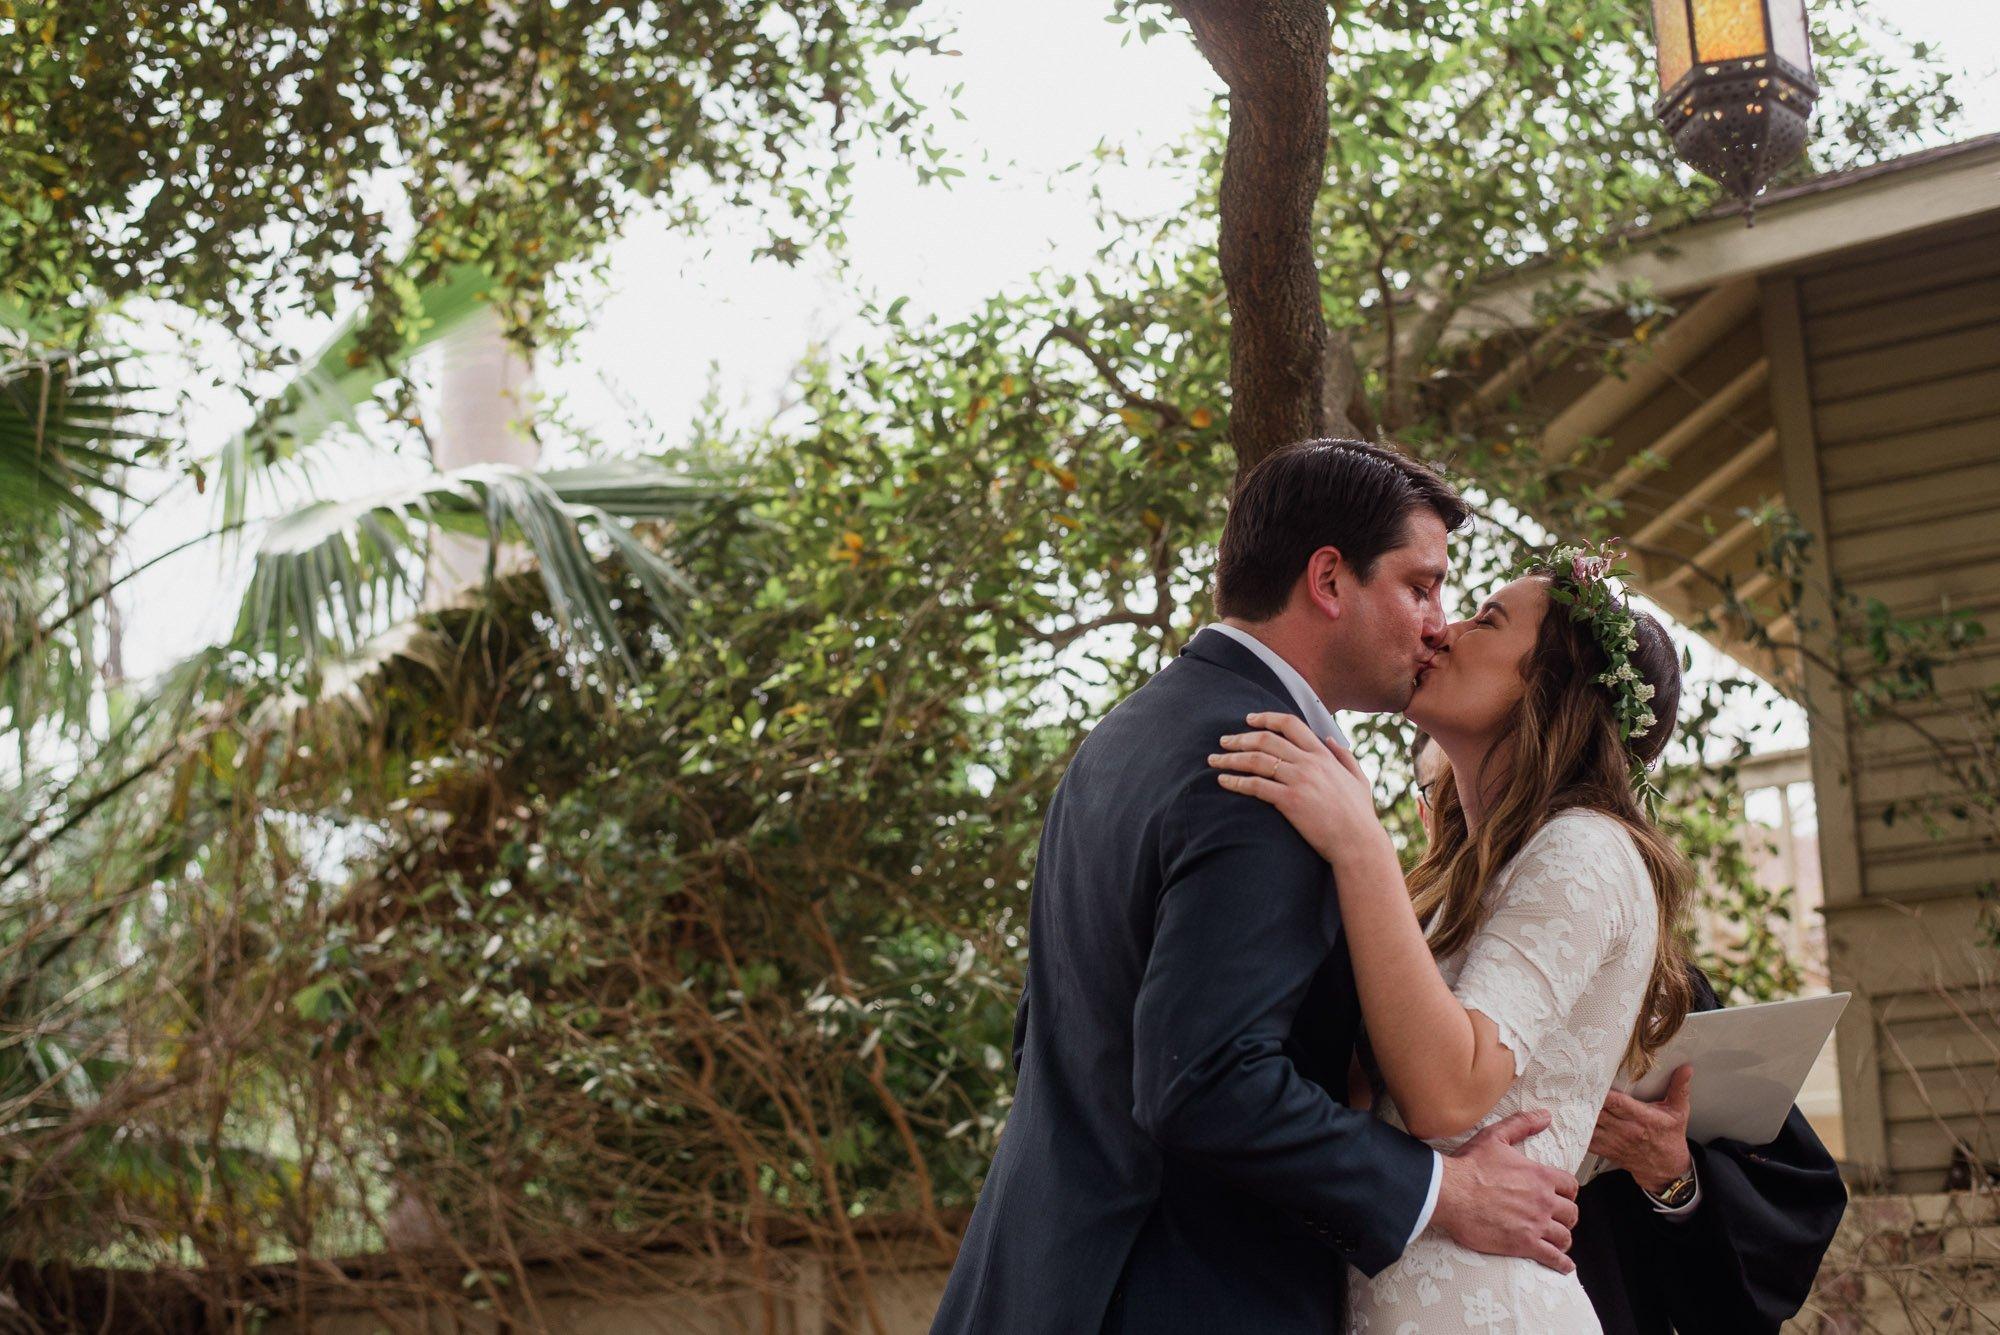 backyard wedding in san antonio, diy wedding at king william manor, king william manor wedding, spring wedding in san antonio